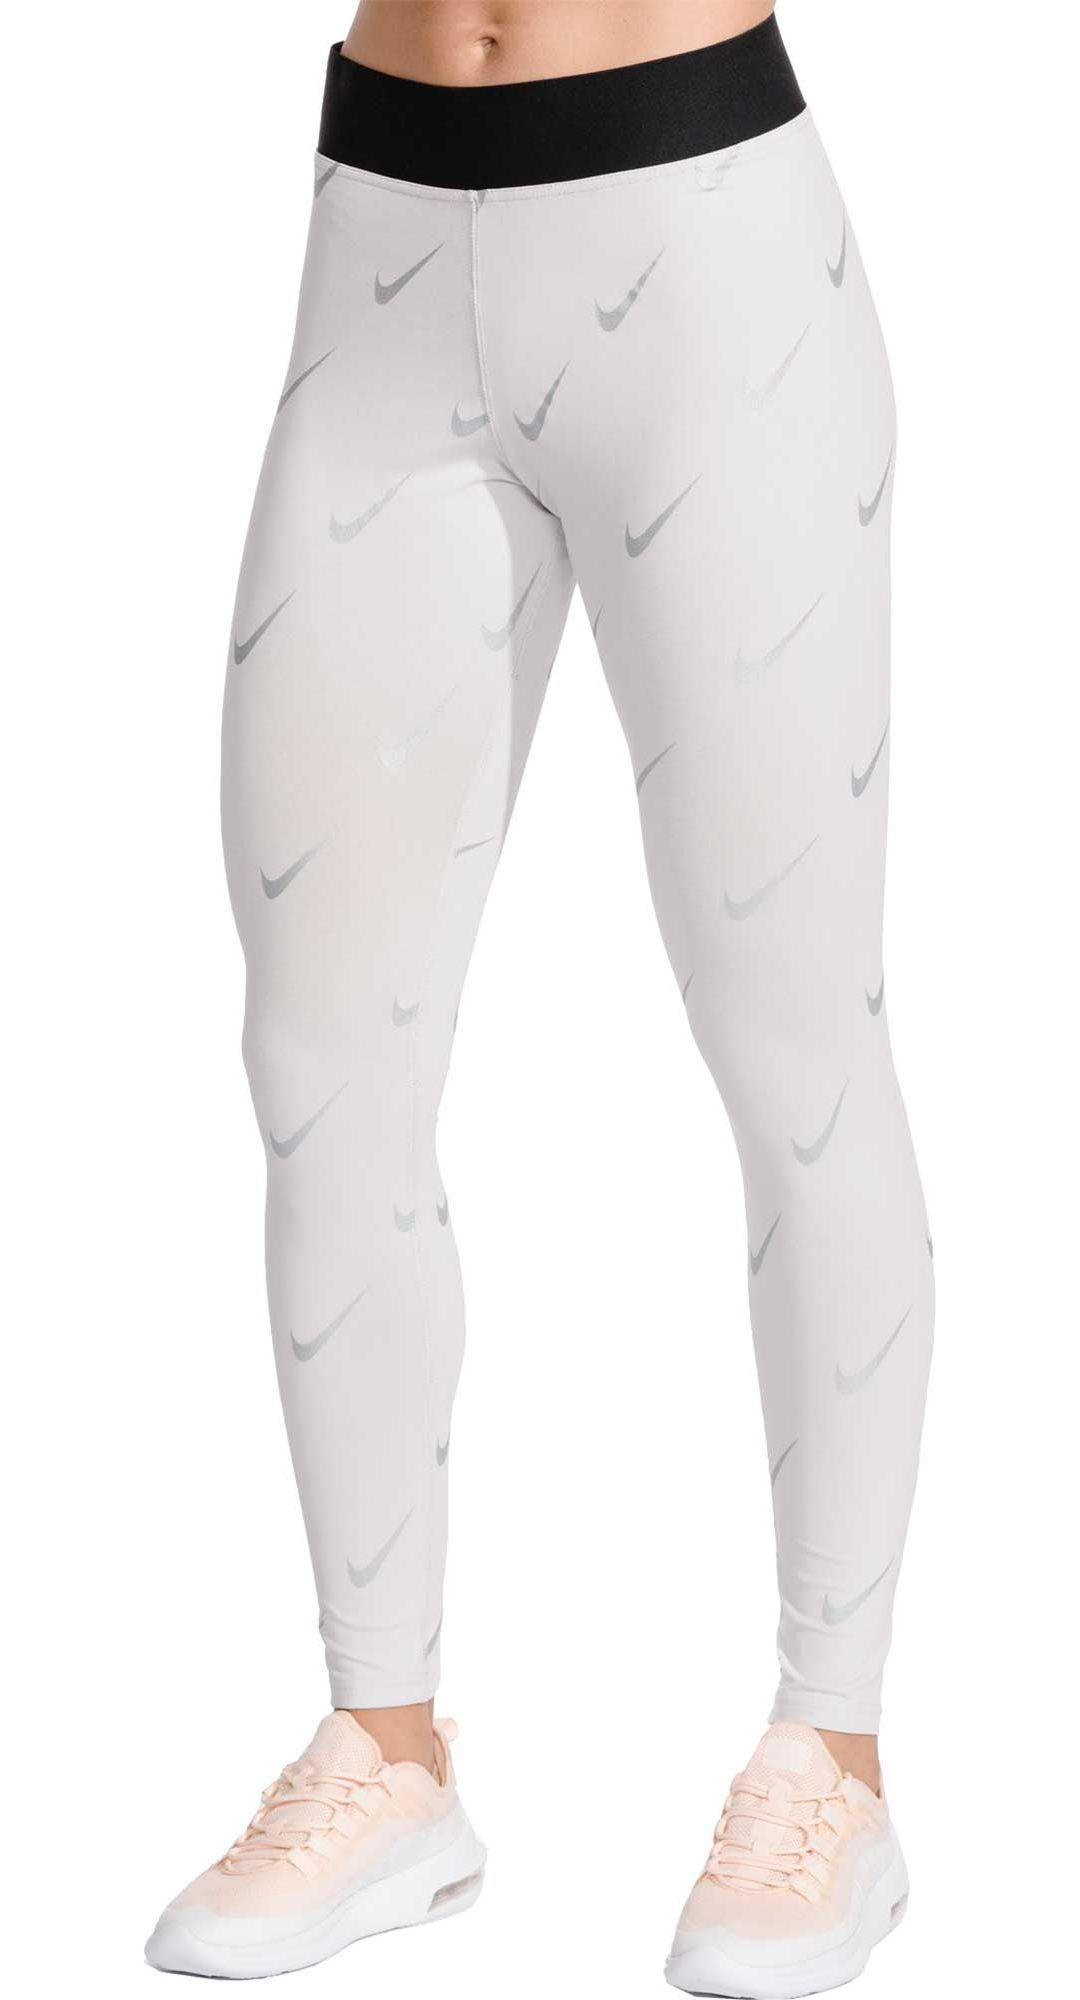 3e6eb675d9a838 Nike Women's Sportswear Leg-A-See Metallic Leggings. noImageFound. Previous